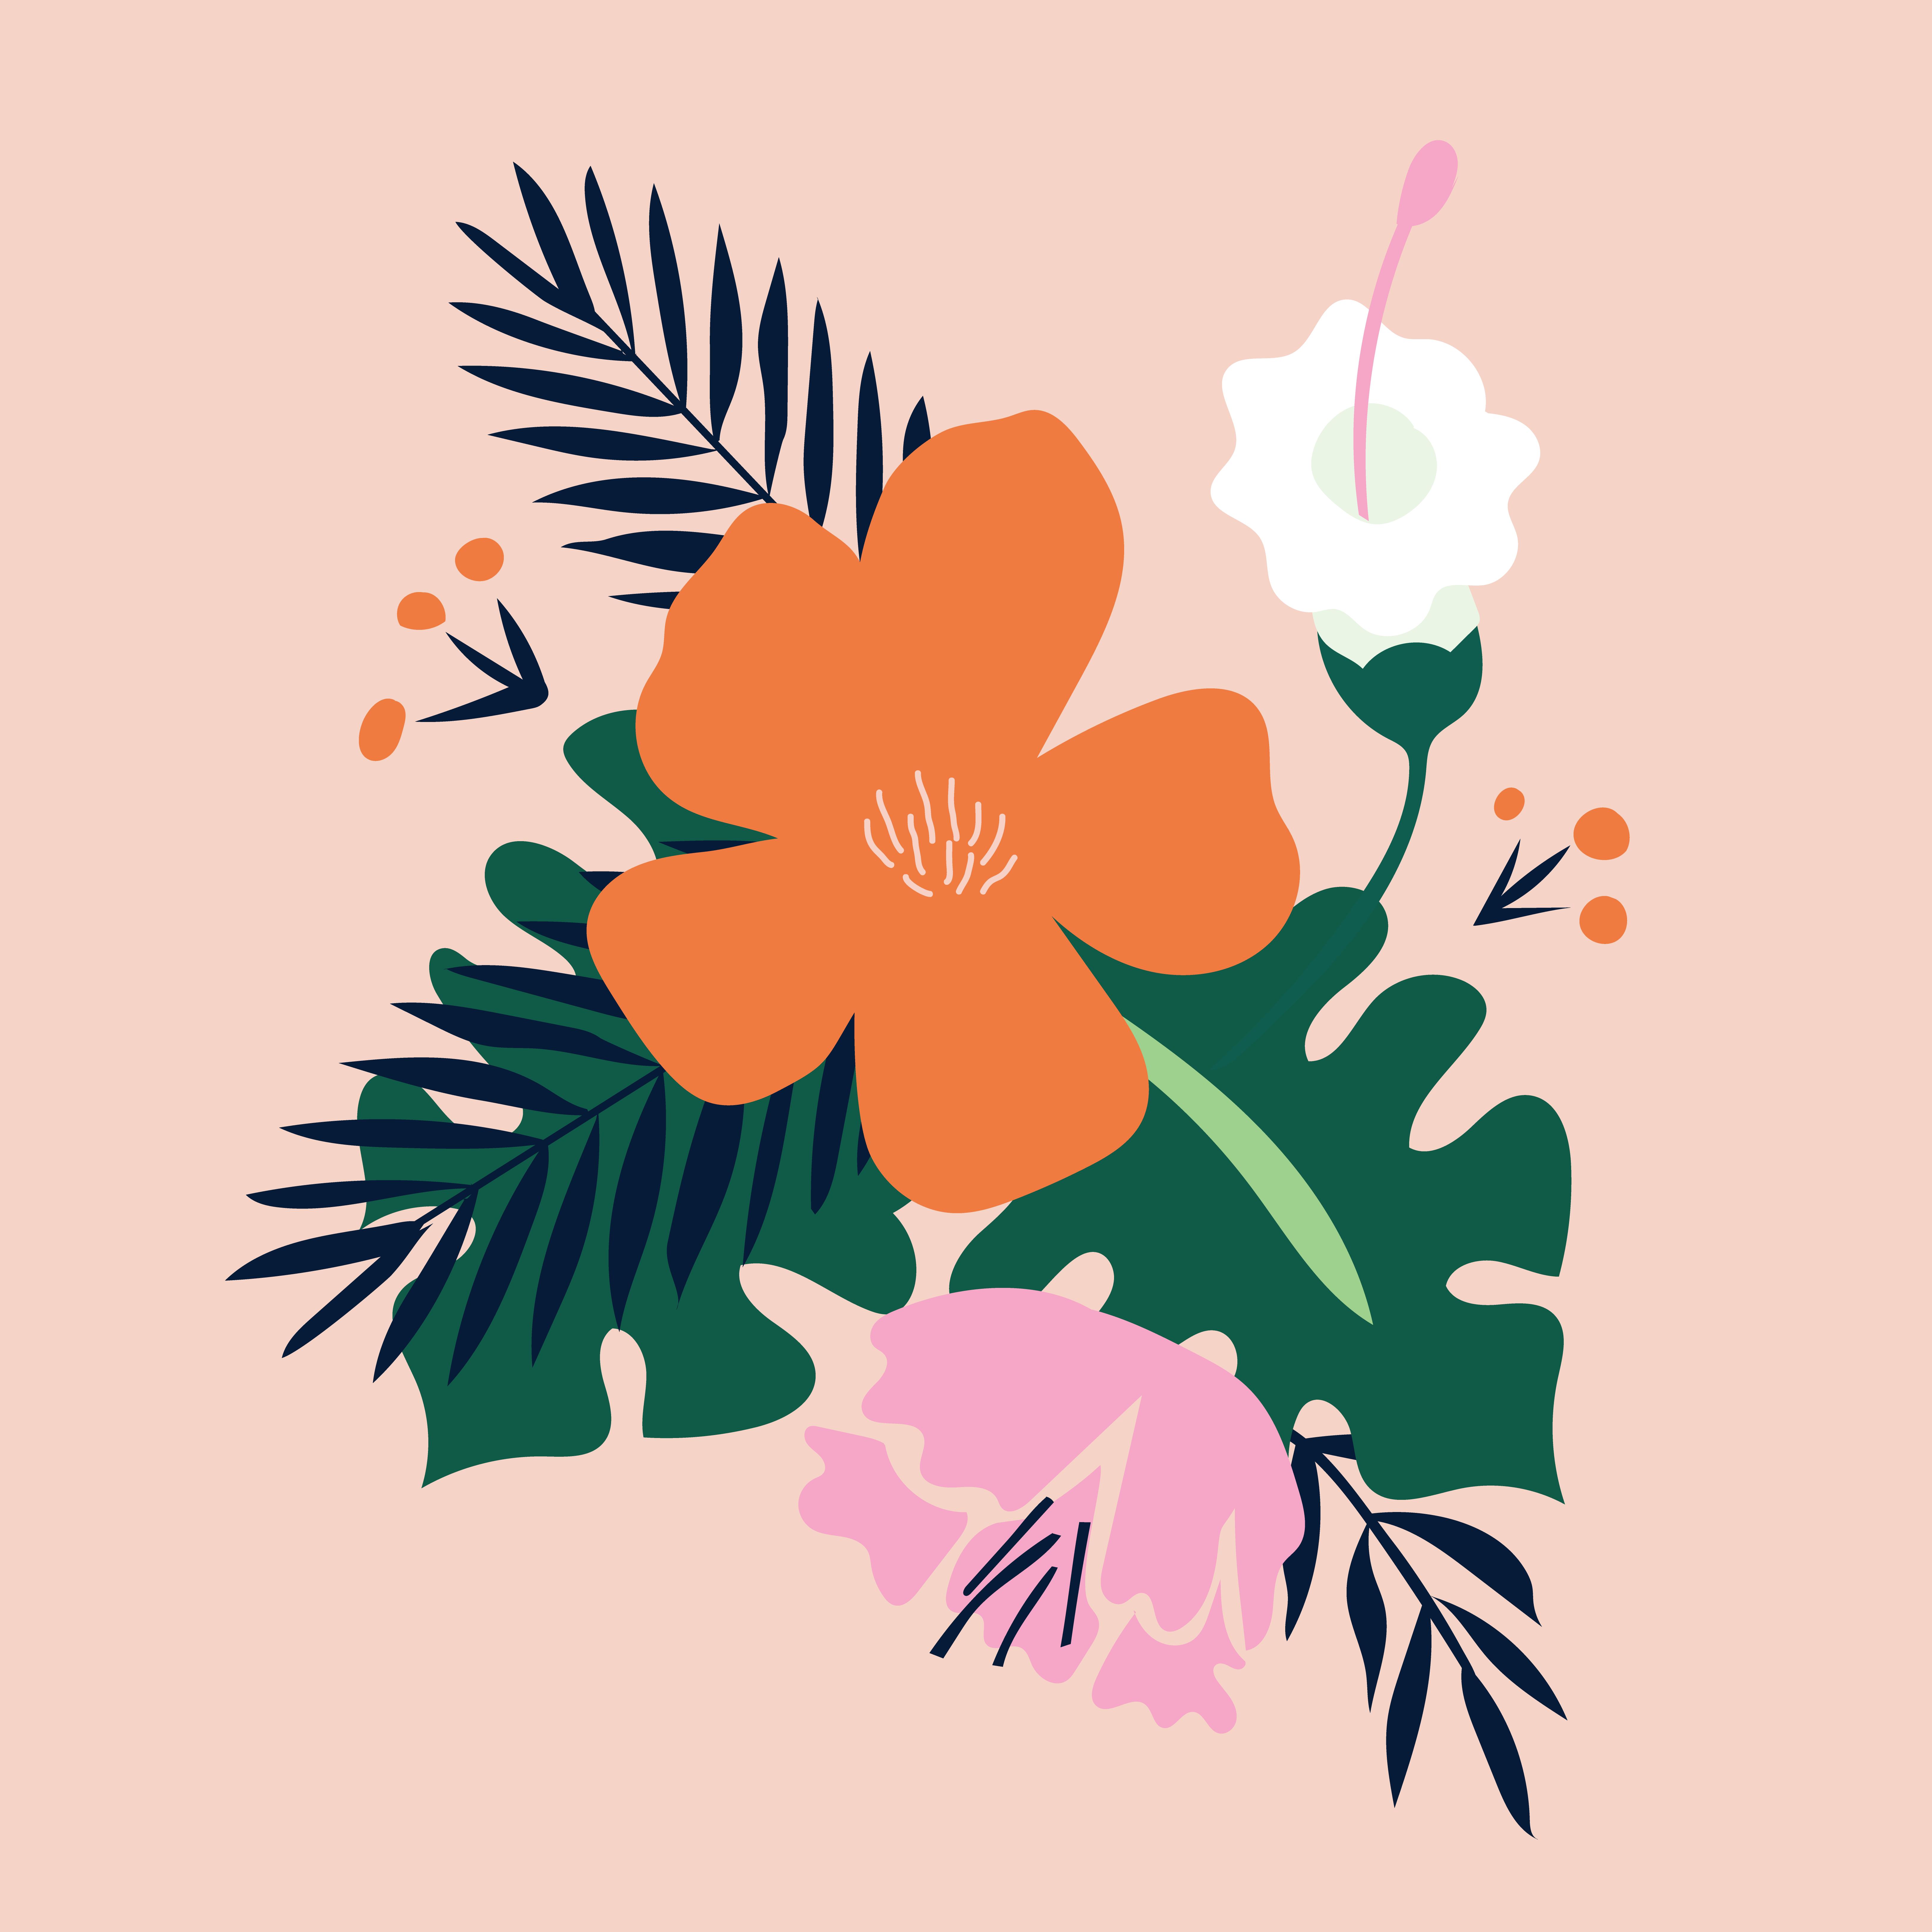 Spring Flowers Illustration By Bailey Mcginn Pinterest